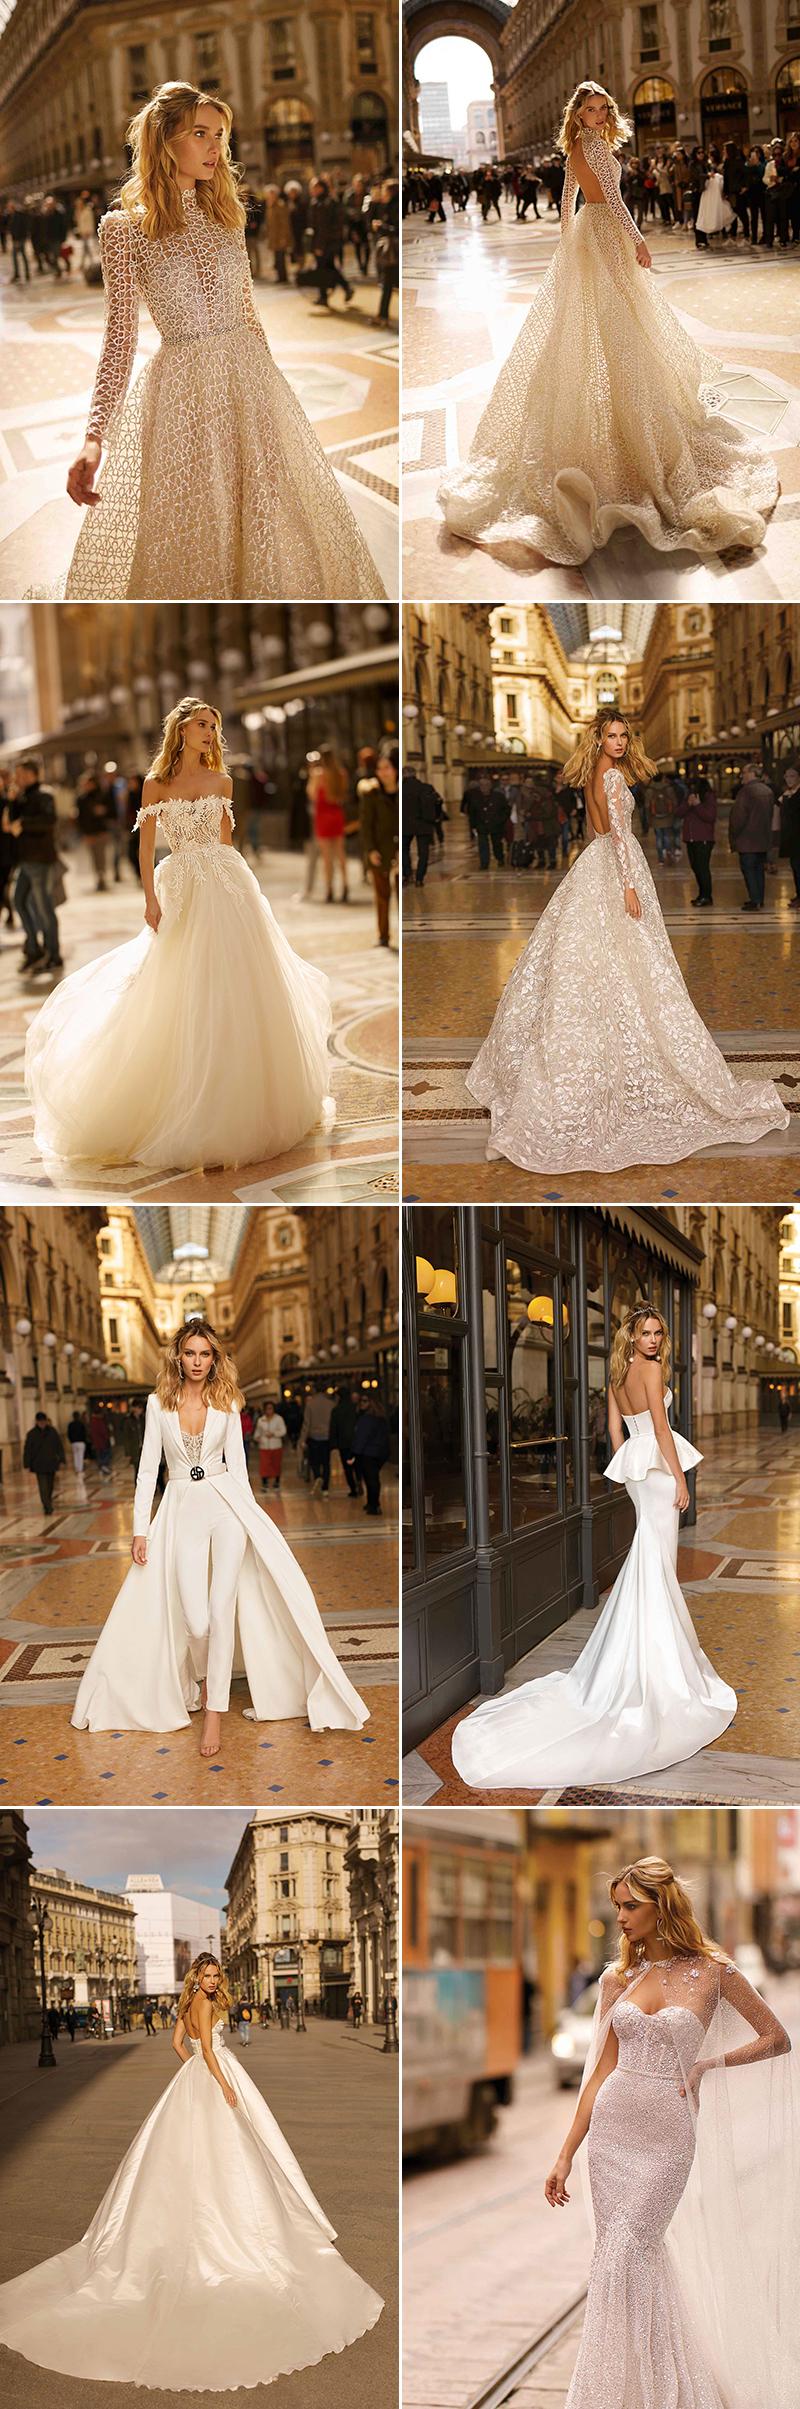 Modern classic wedding dress